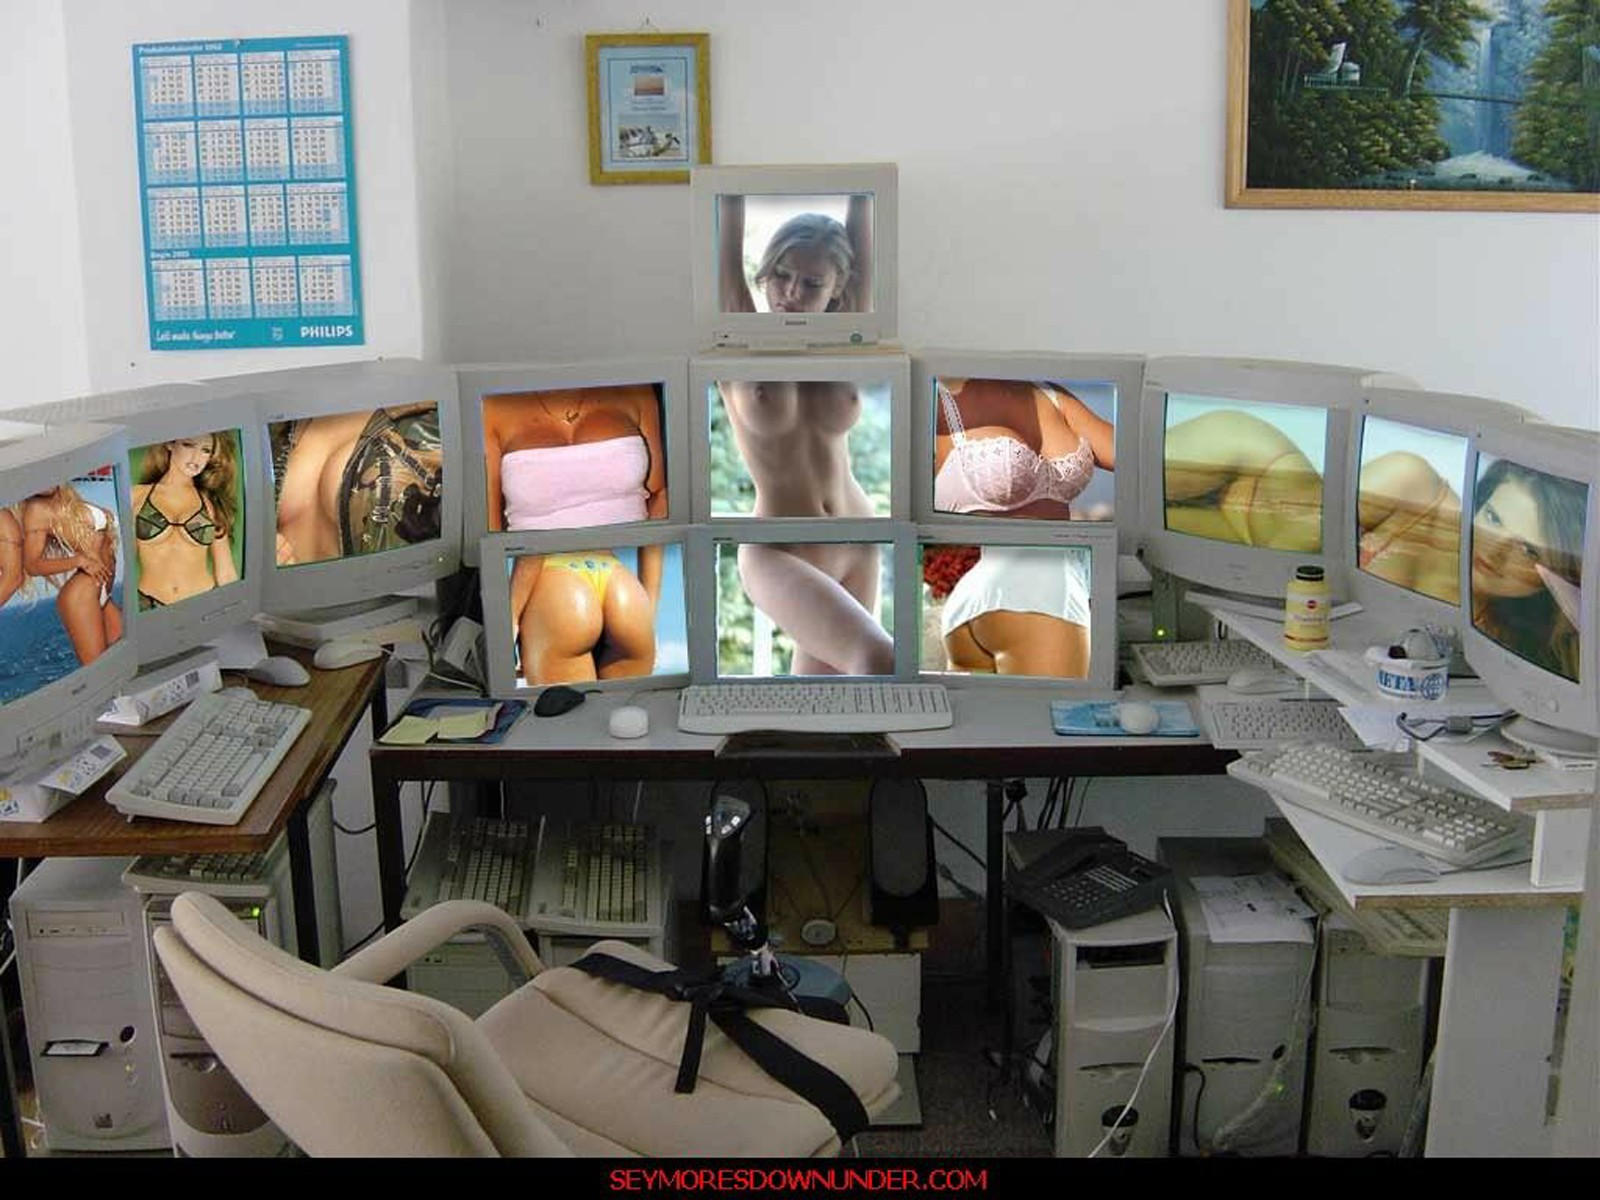 Голые девушки на экранах